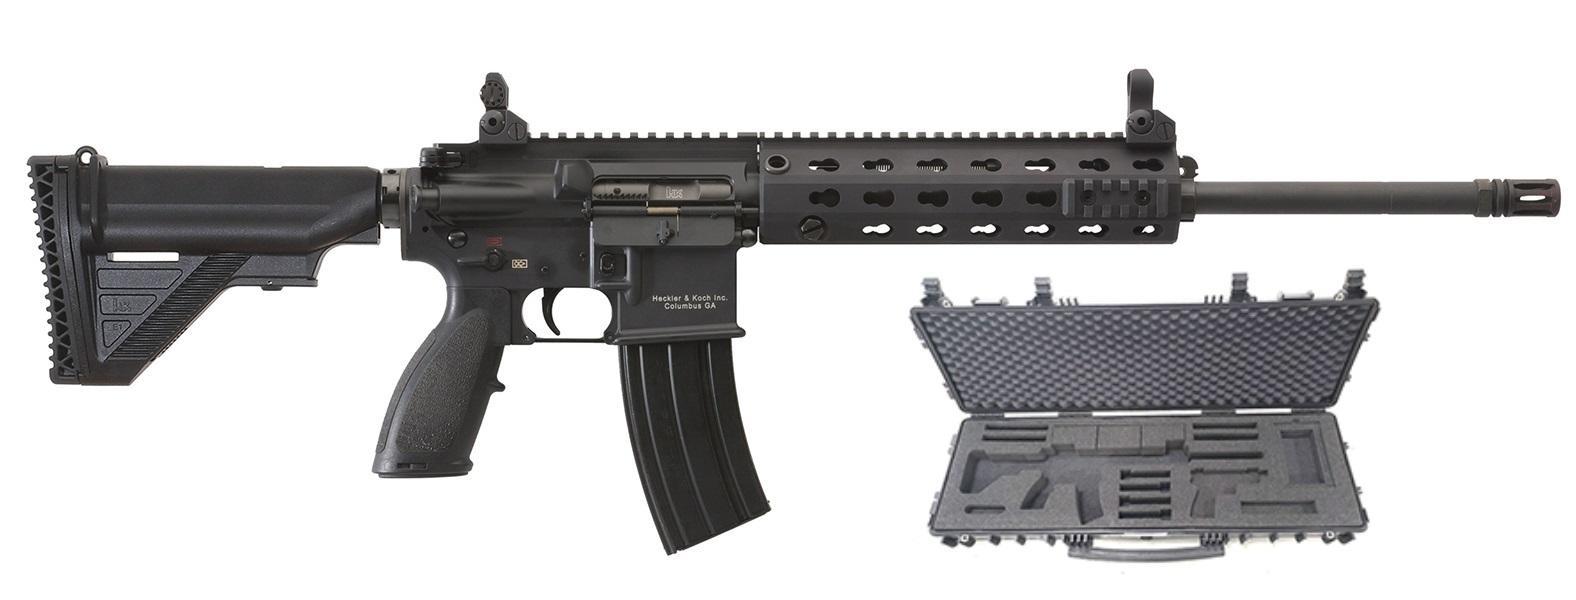 MR556 5.56MM 16.5 30RD PKG - 81000459 | EXPLORER CASE